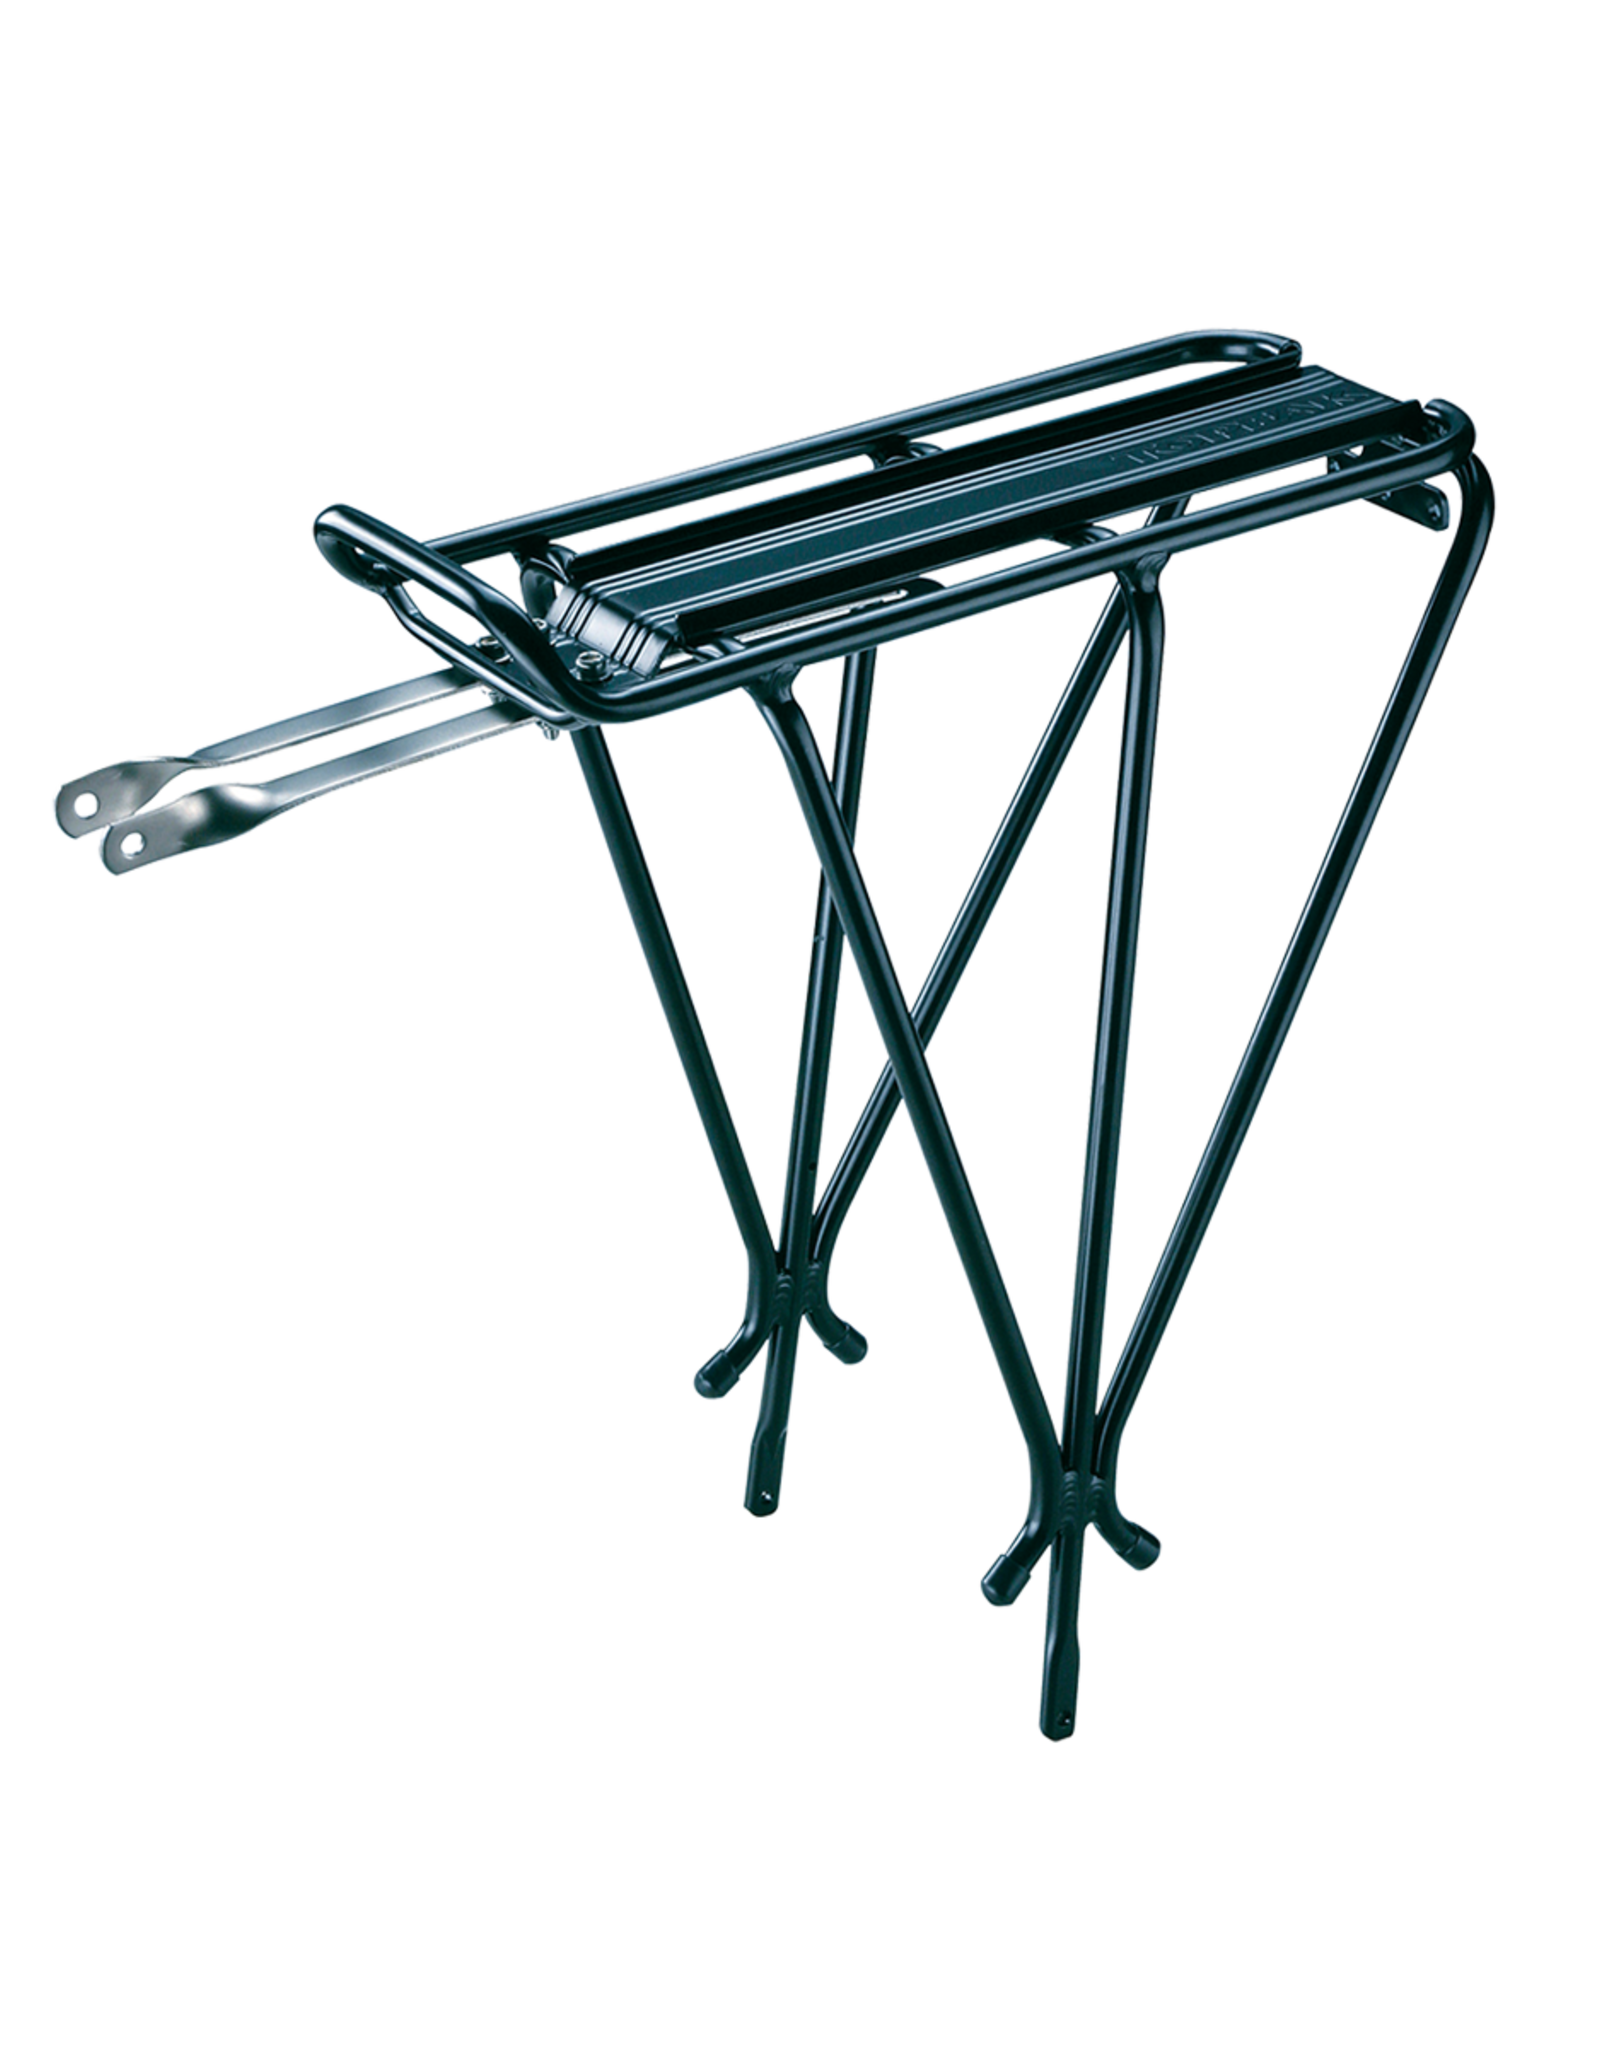 Rack - Topeak Explorer Rear Rack: Black; Fits MTX Trunk Bags (Non-disc, no spring clip)